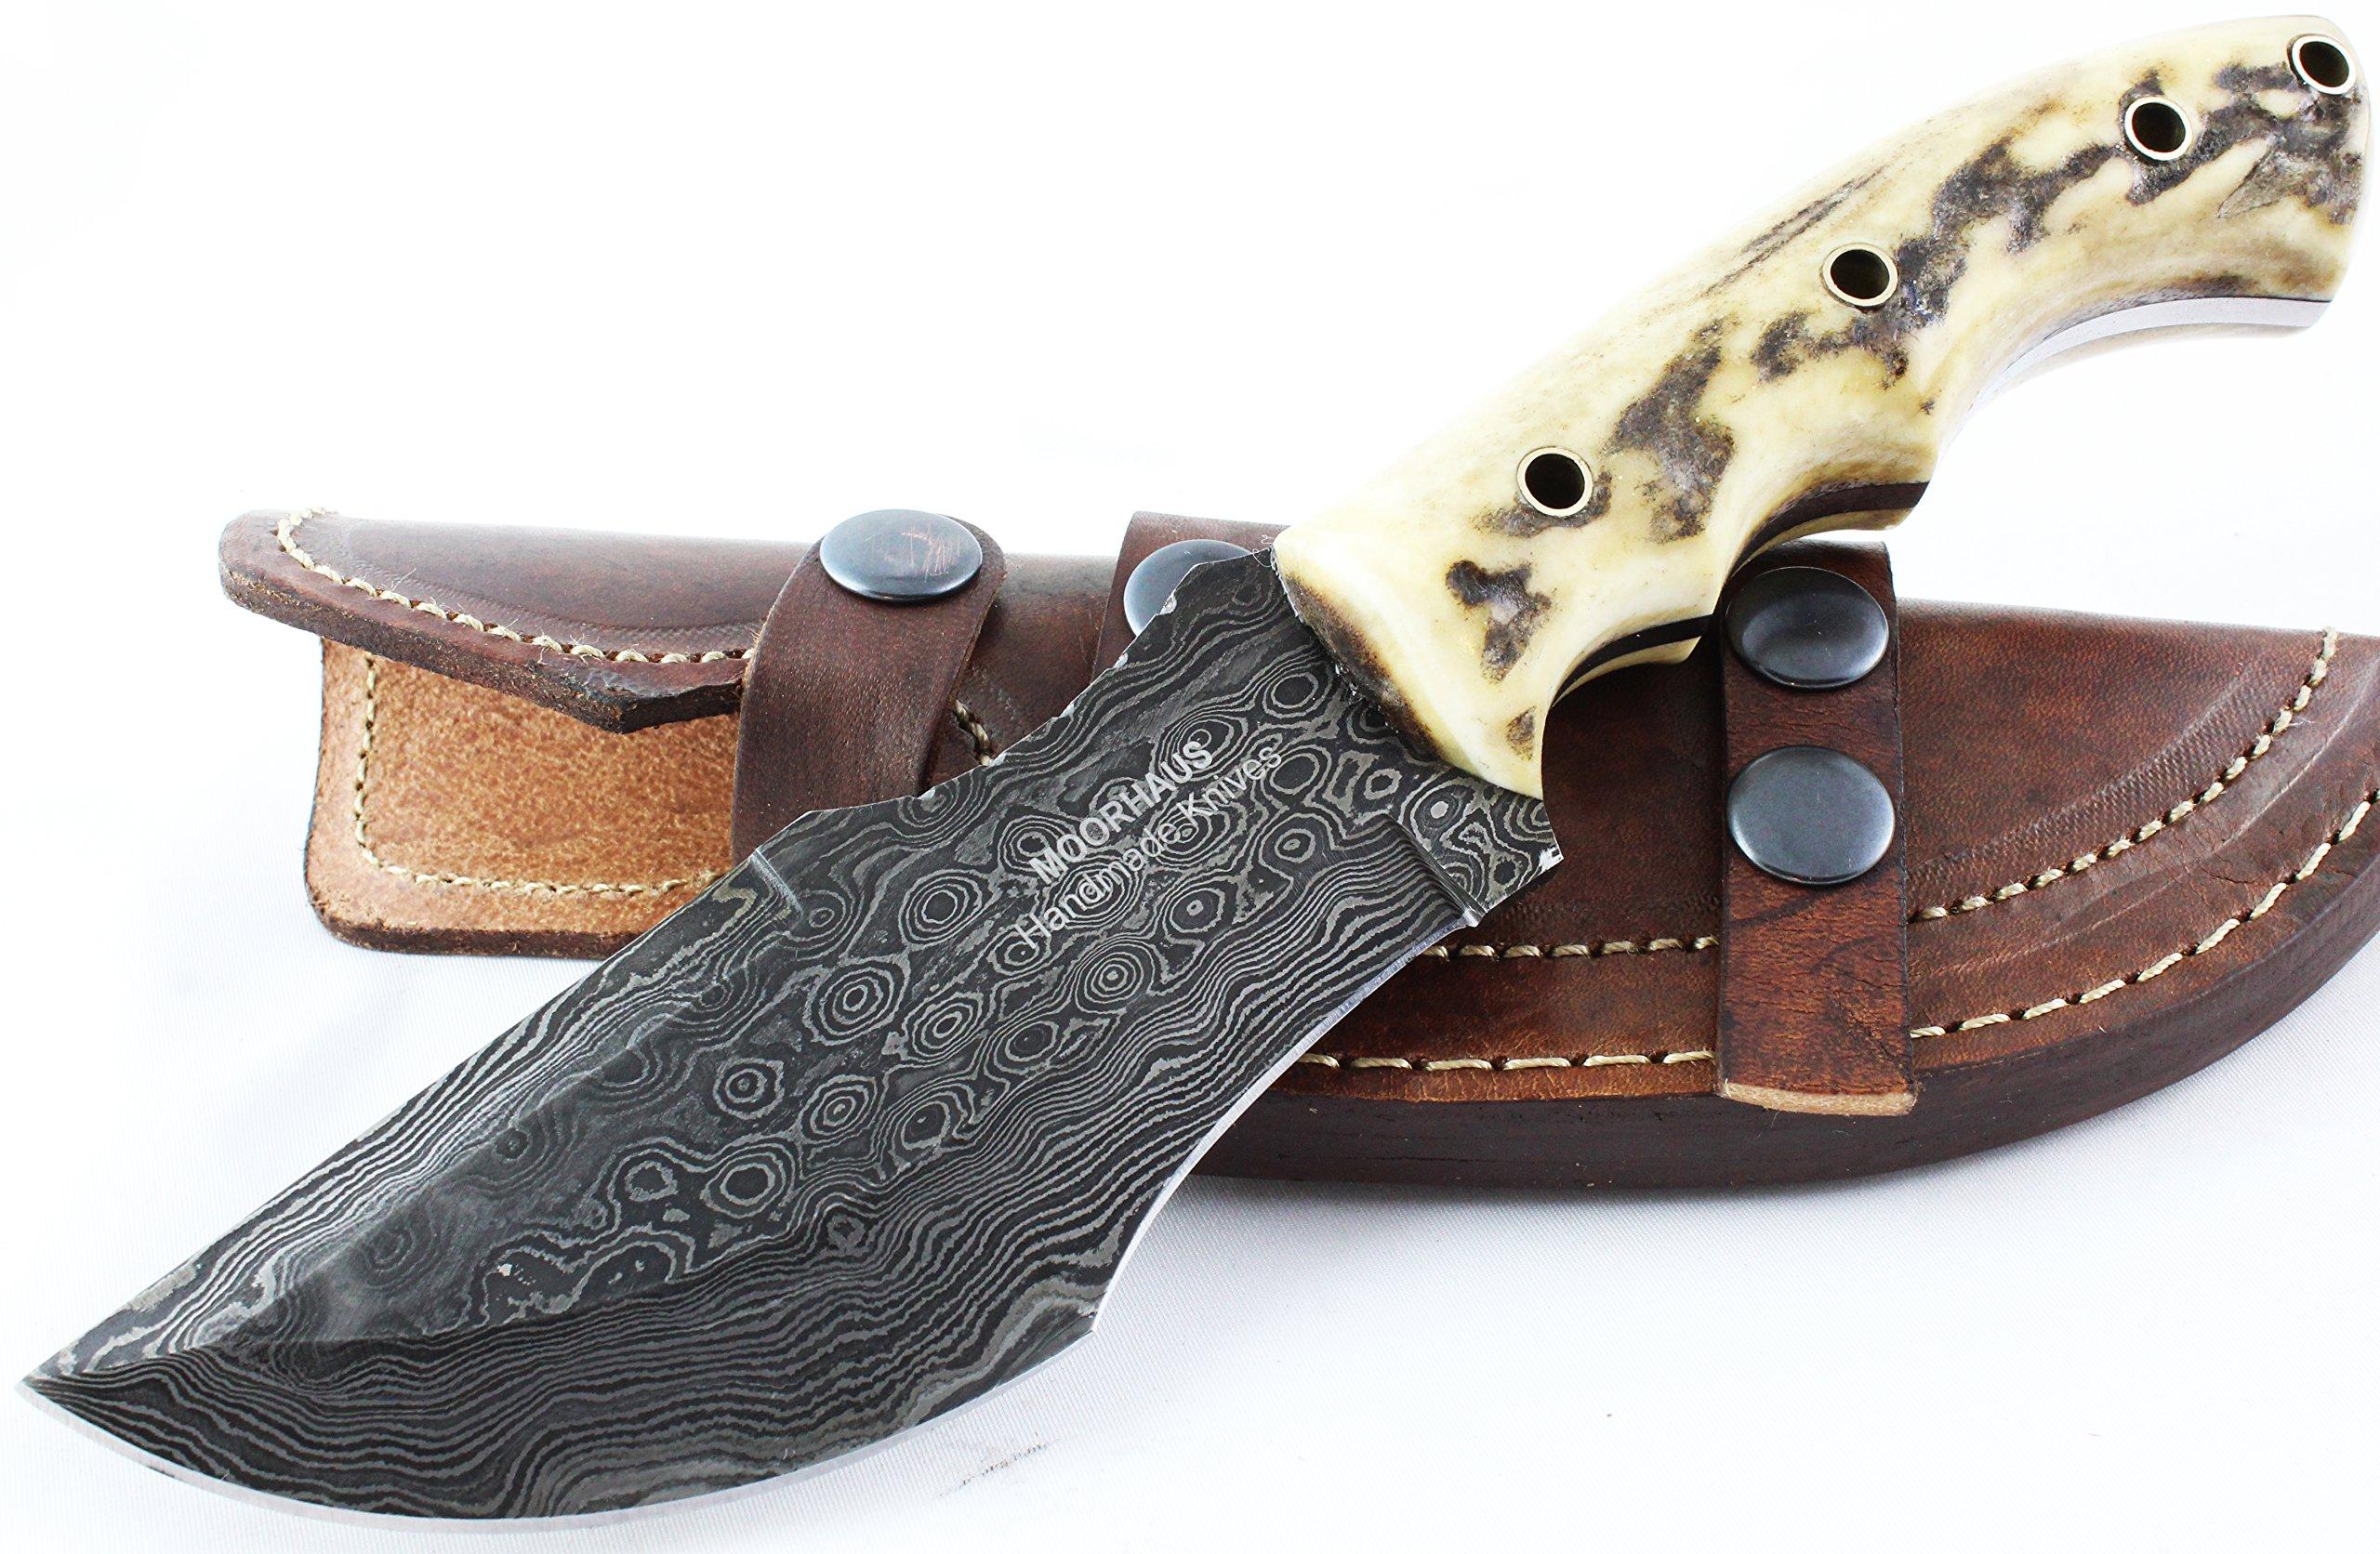 Moorhaus Handmade Raindrop Damascus Genuine Stag Tracker Knife Sub Hilt with Serrated Upper Spine - a work of art!